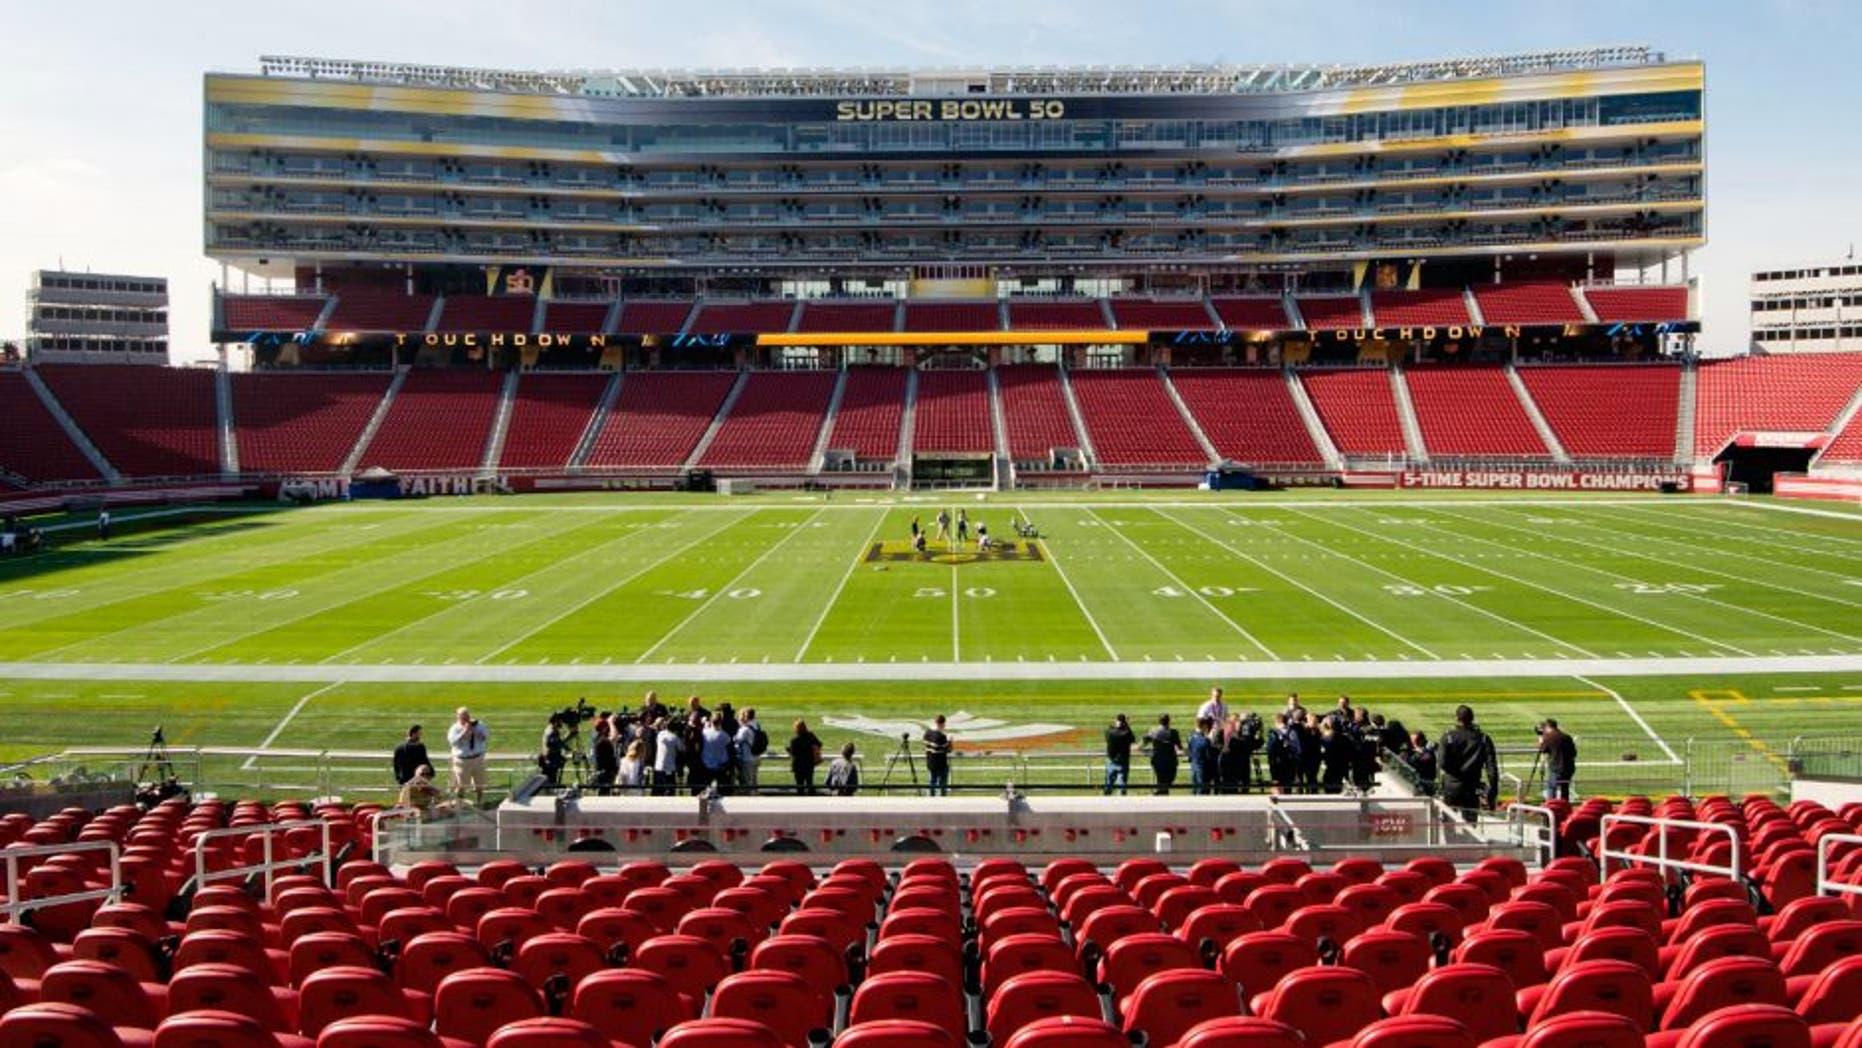 January 26, 2016; Santa Clara, CA, USA; General view of Levi's Stadium during a field preparation press conference prior to Super Bowl 50. Mandatory Credit: Kyle Terada-USA TODAY Sports